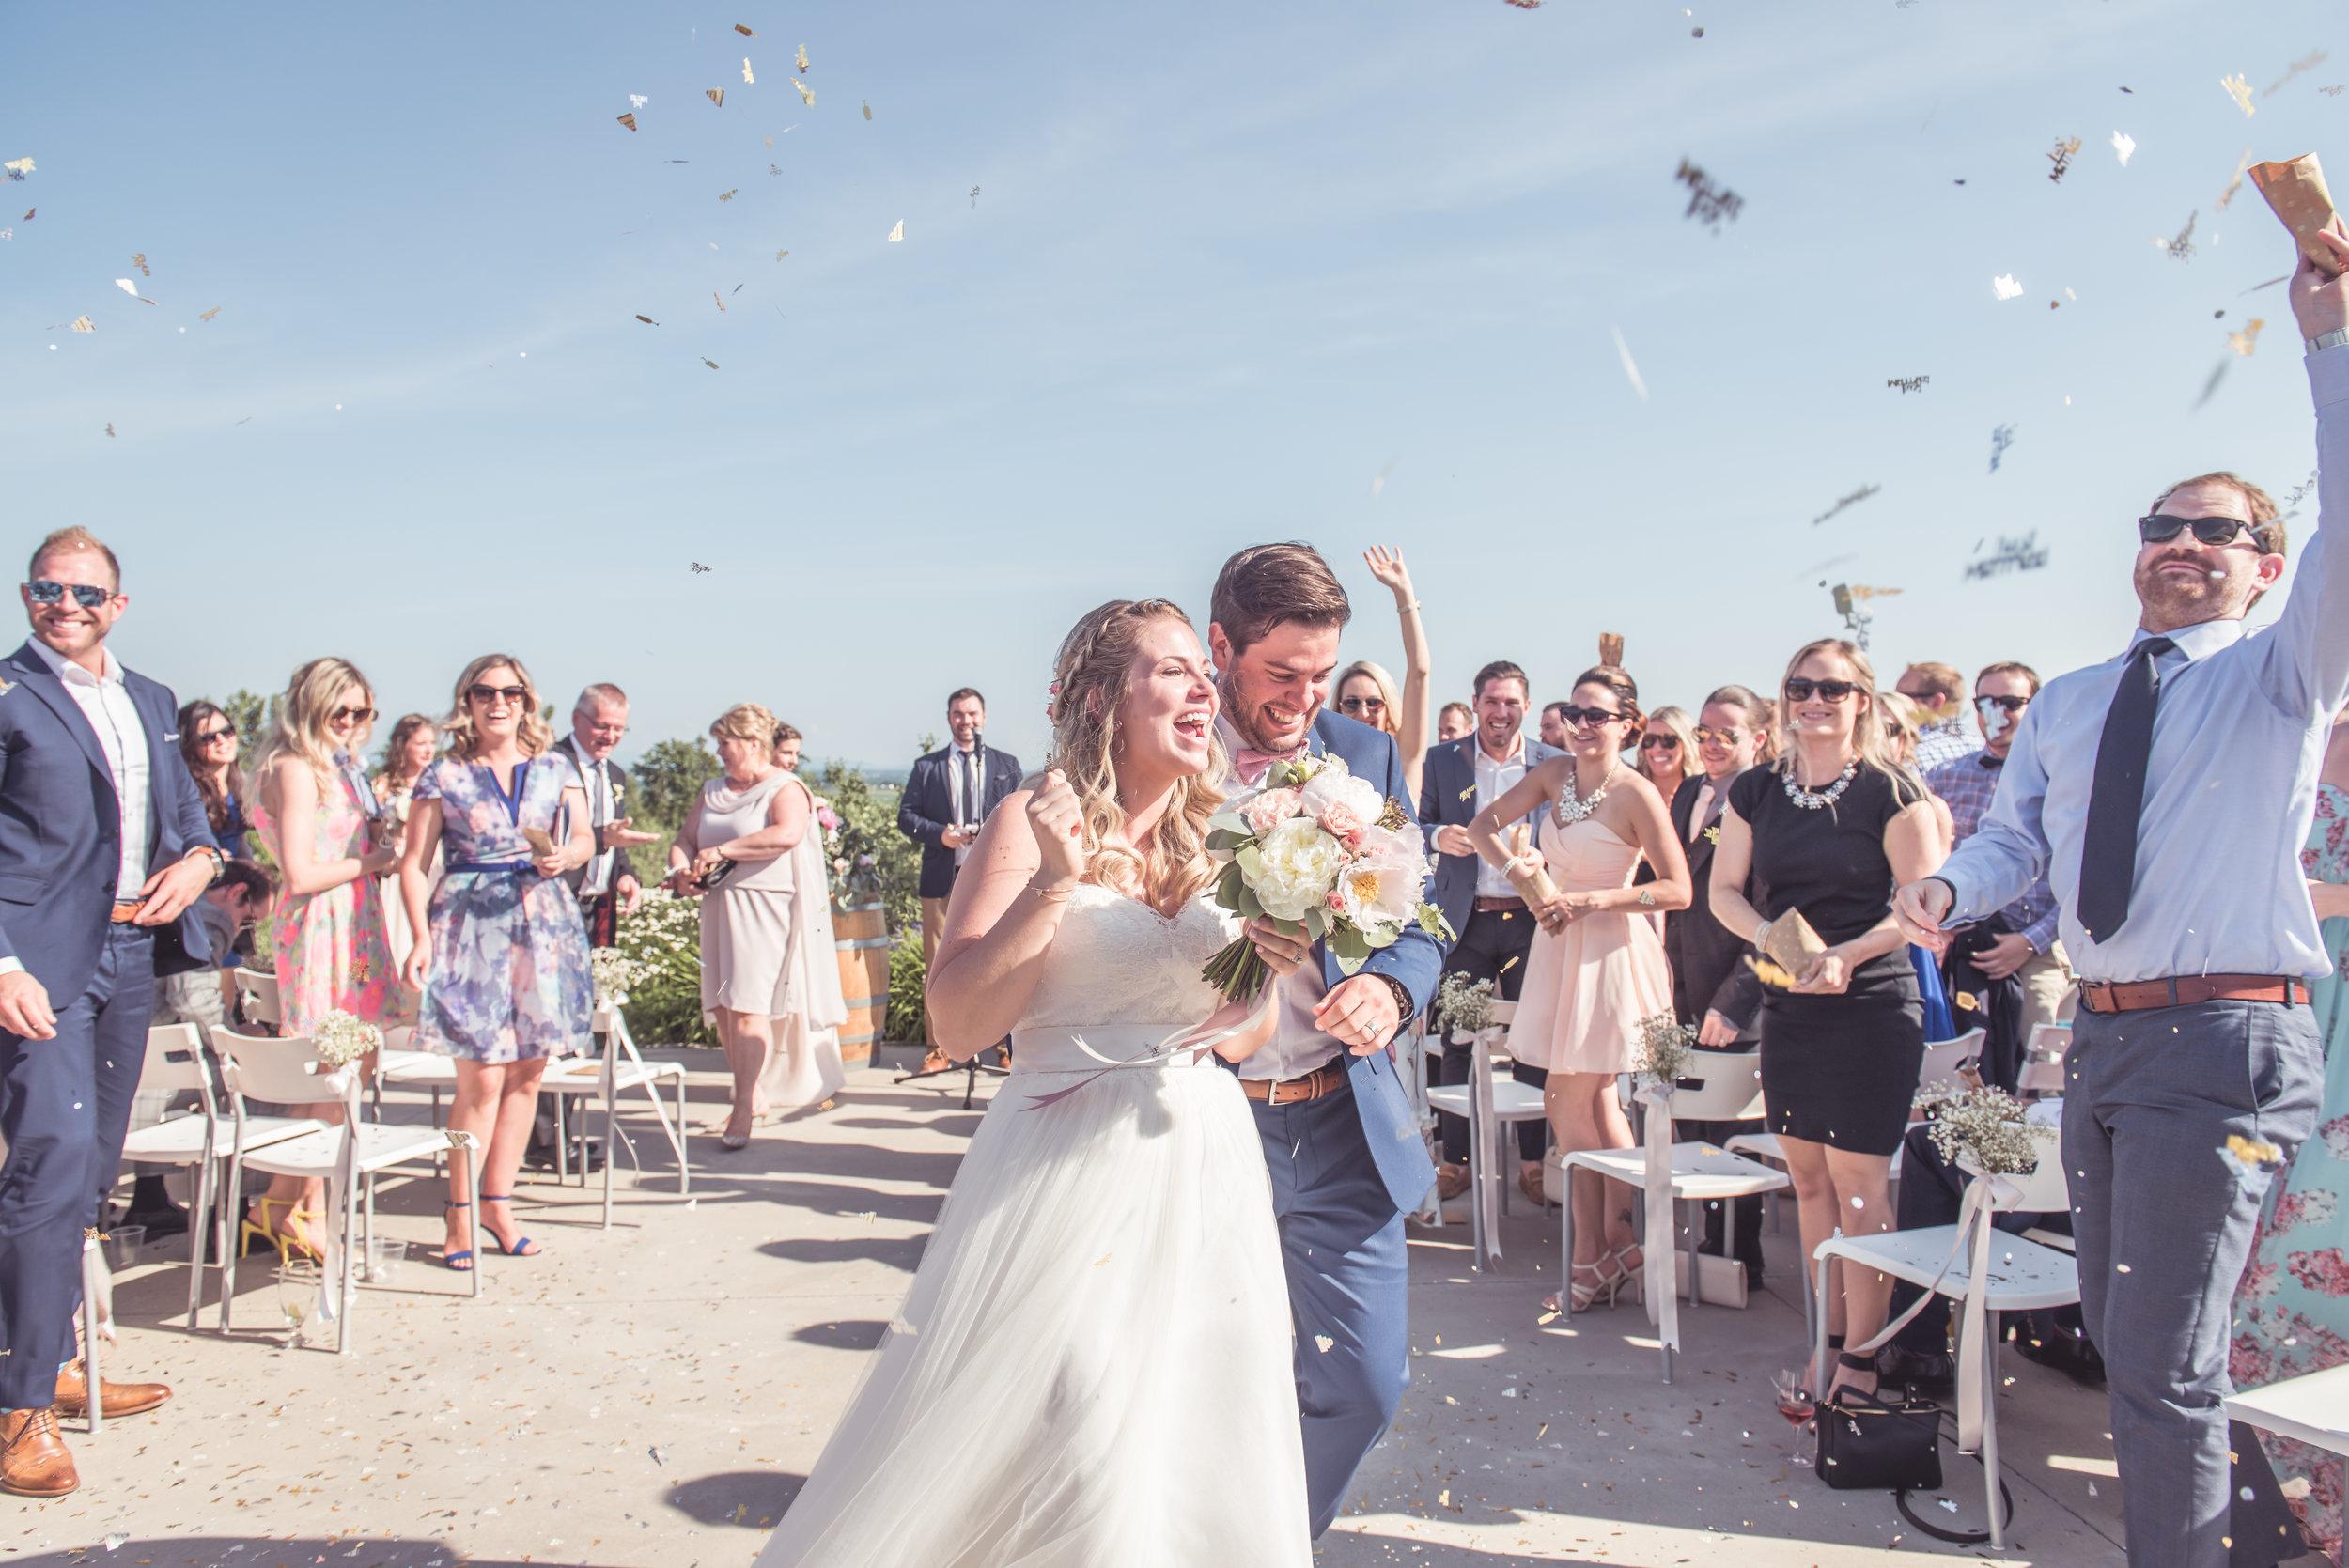 RR_S&C_Wedding_renrob©-103.jpg